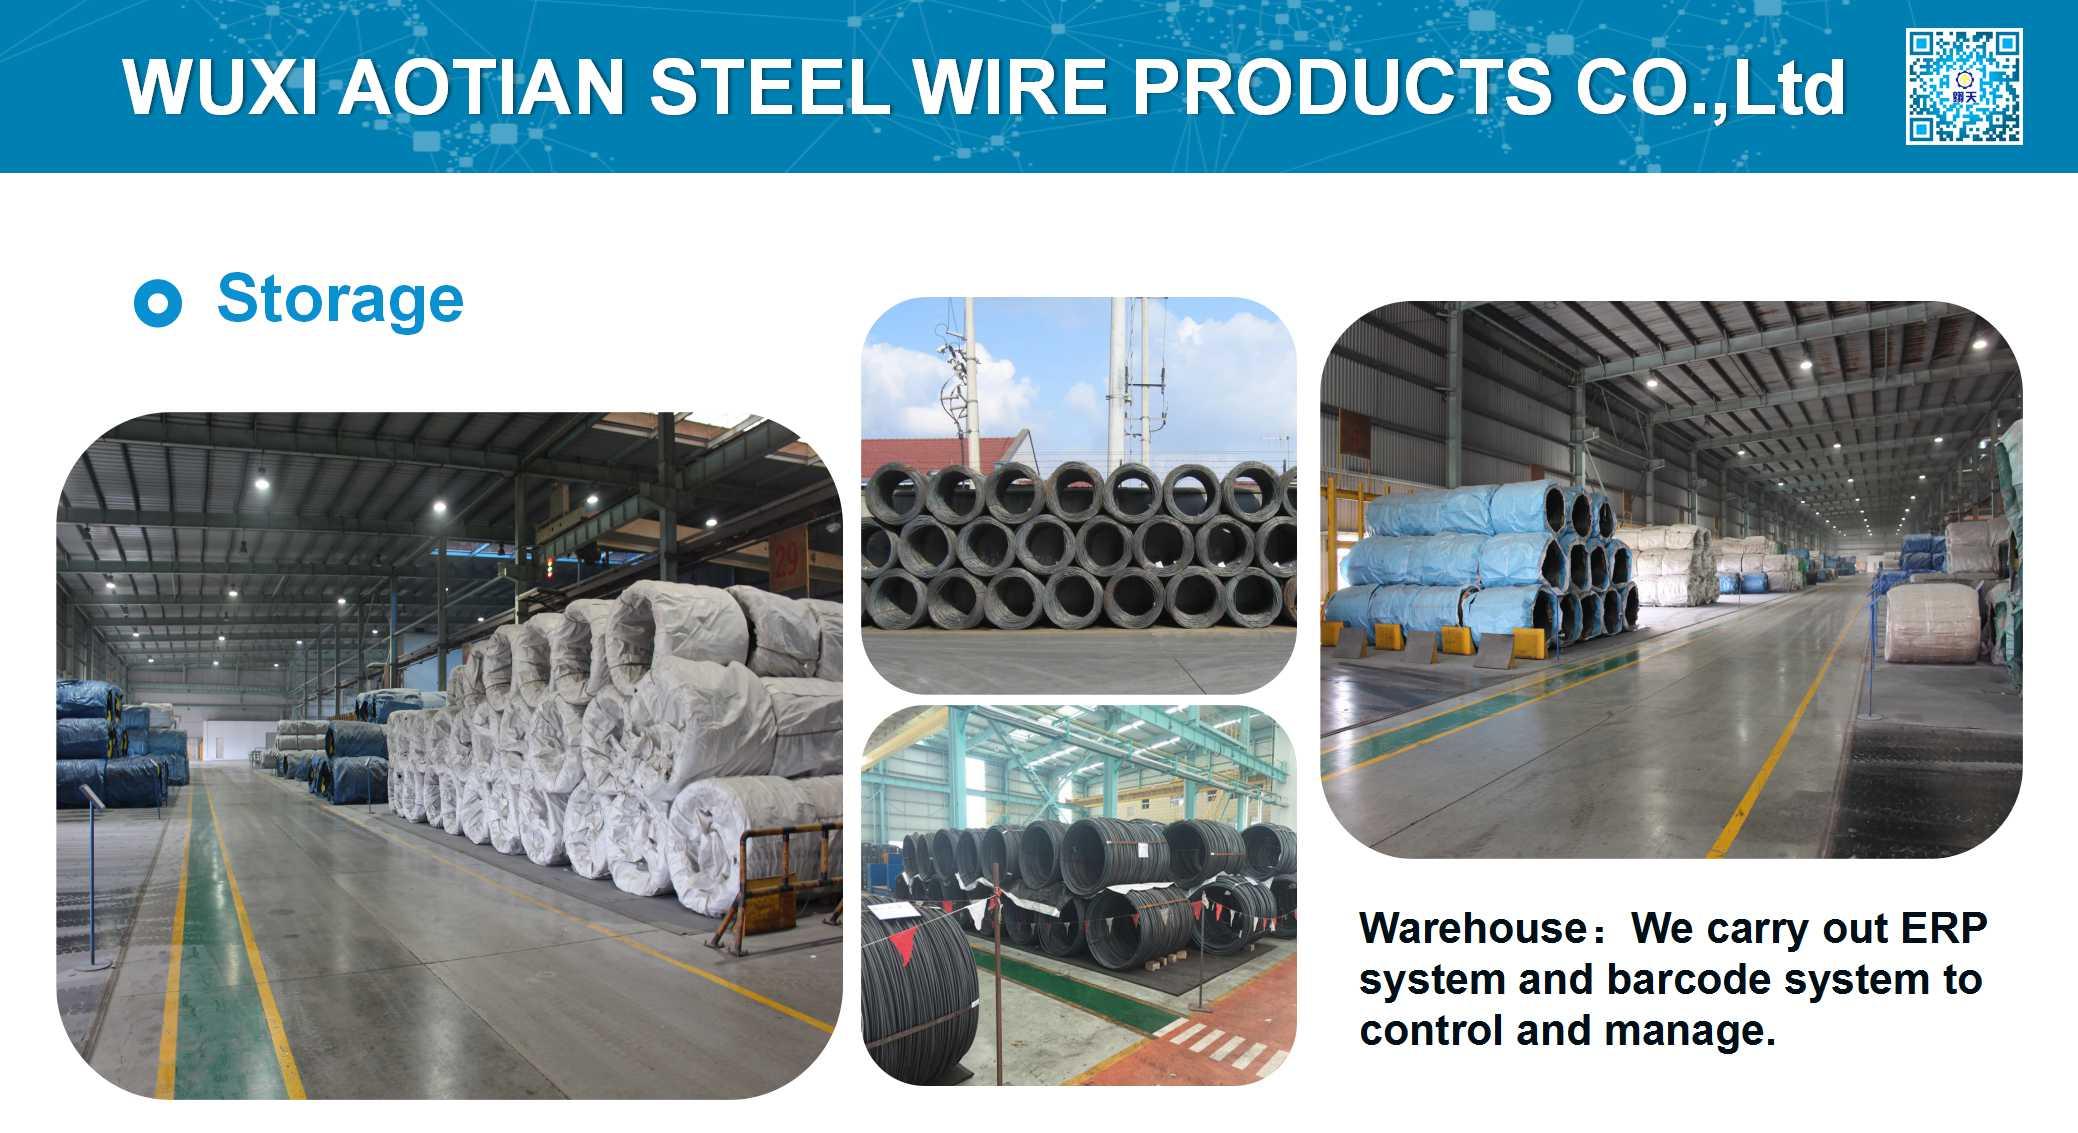 Storage of wire rod